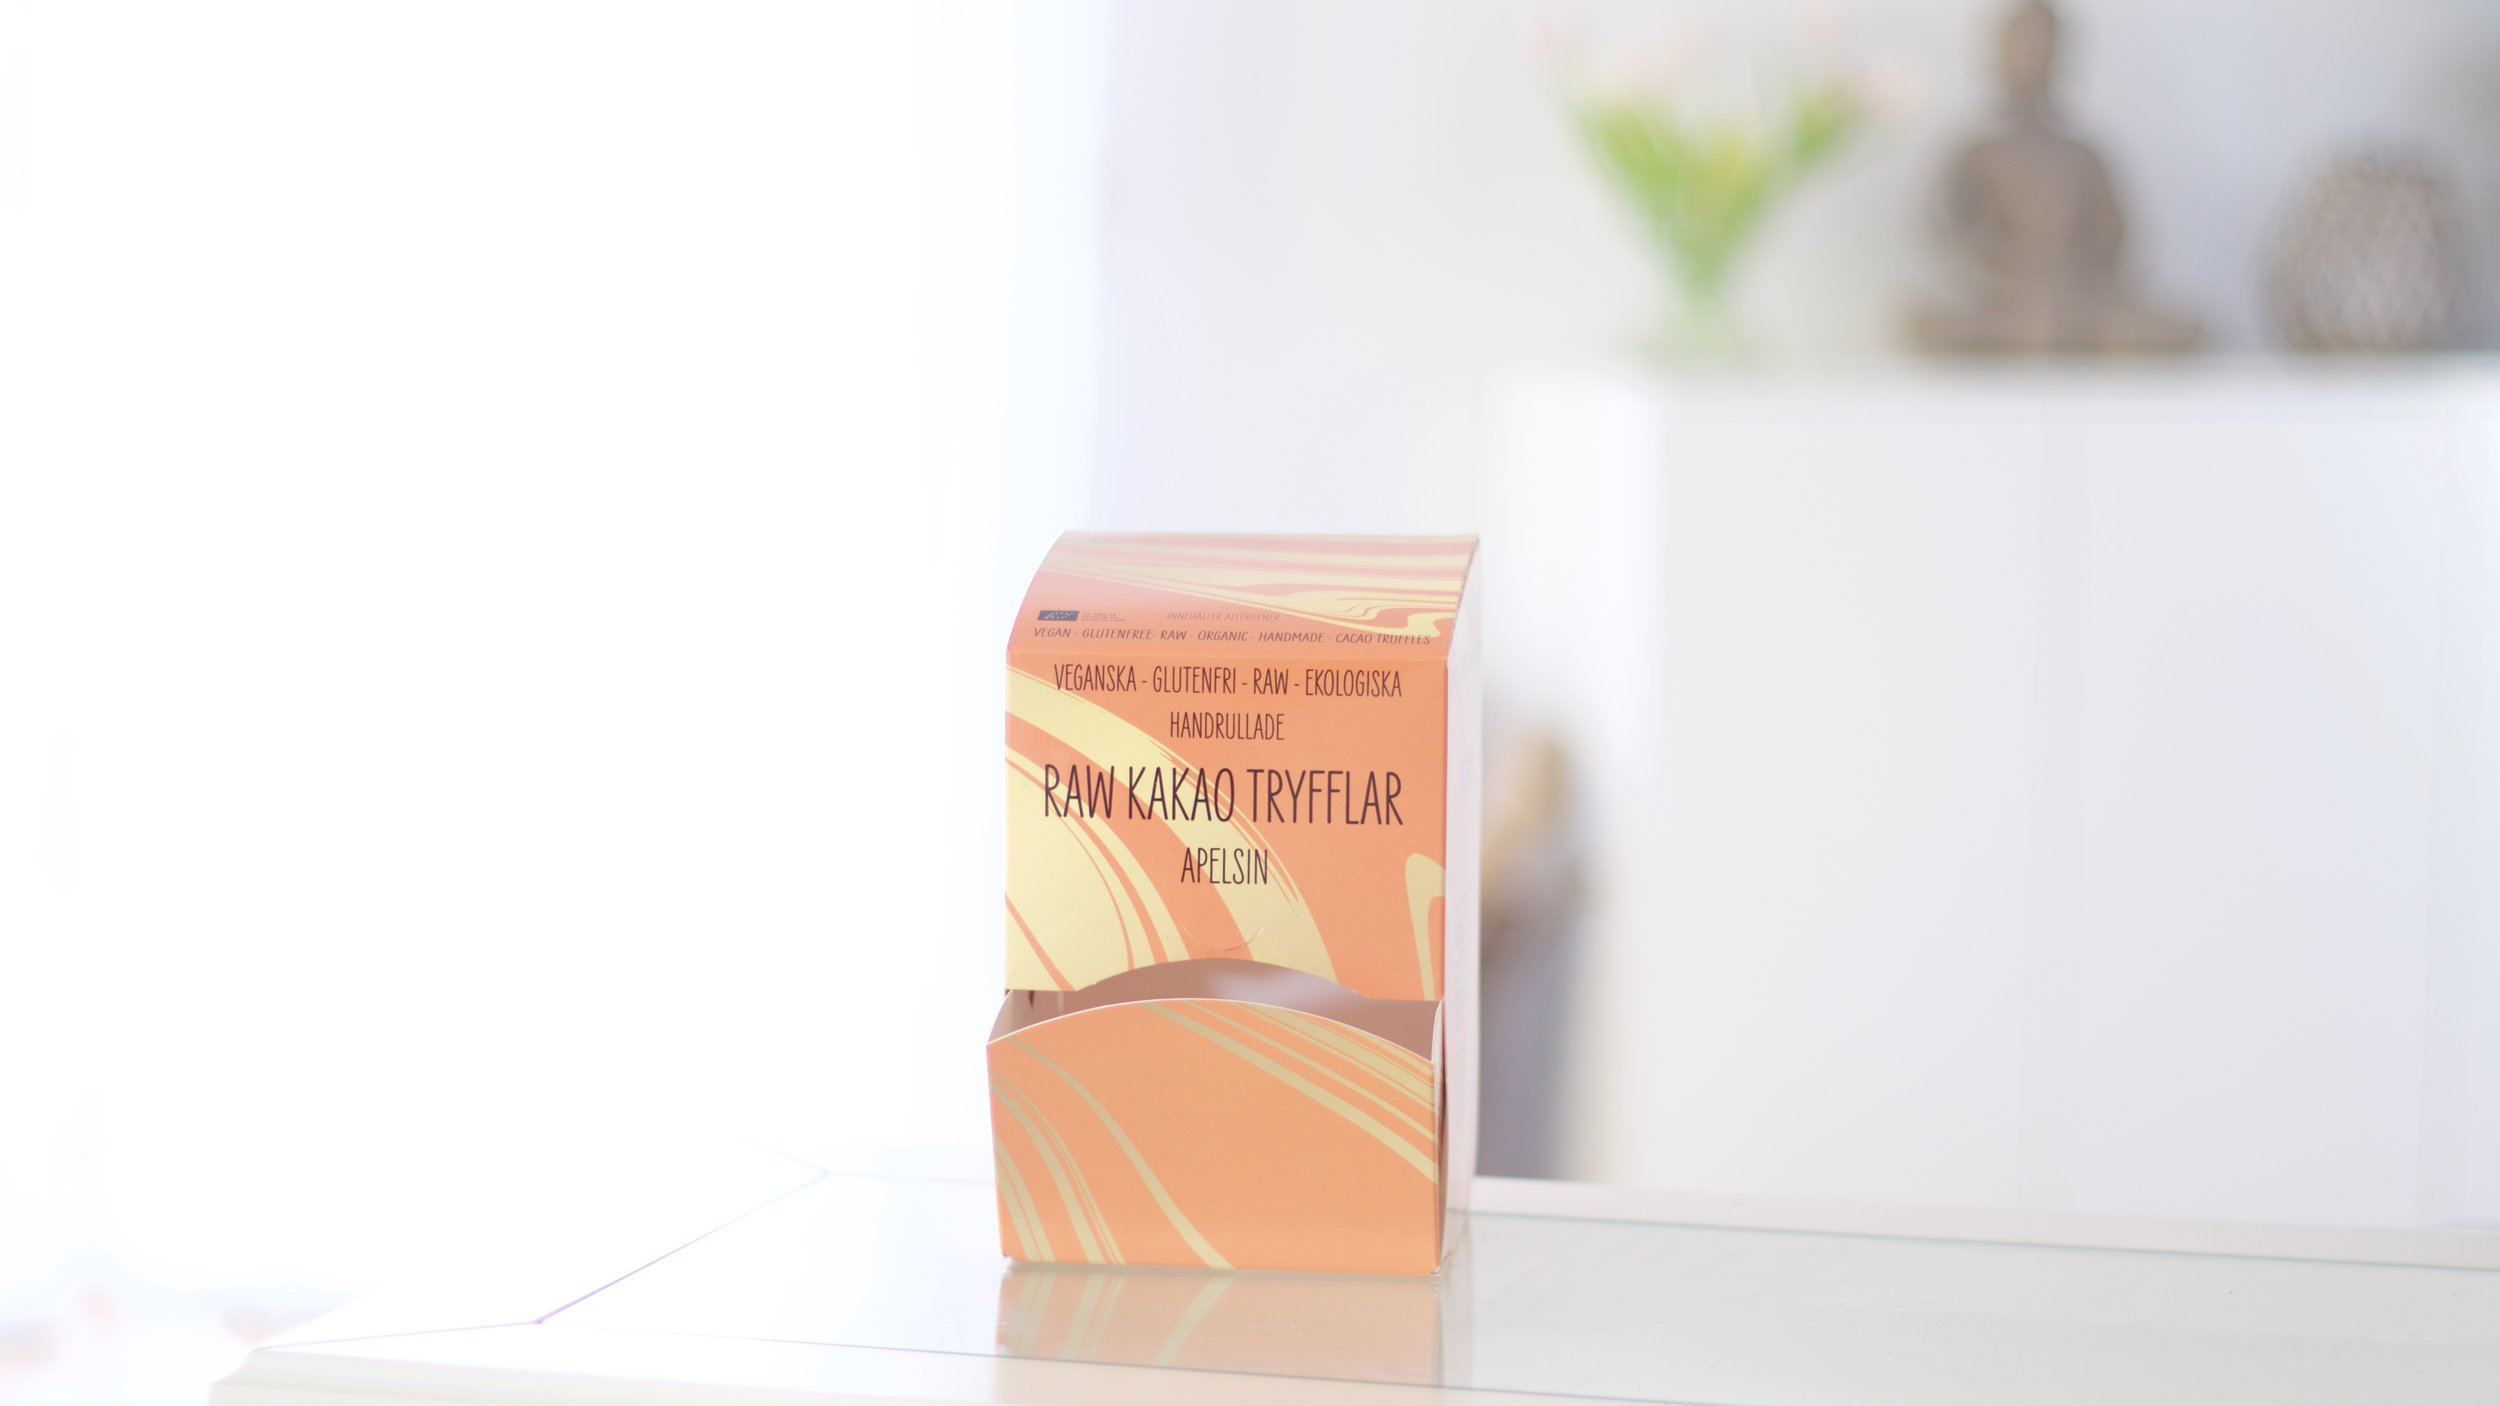 Apelsin box